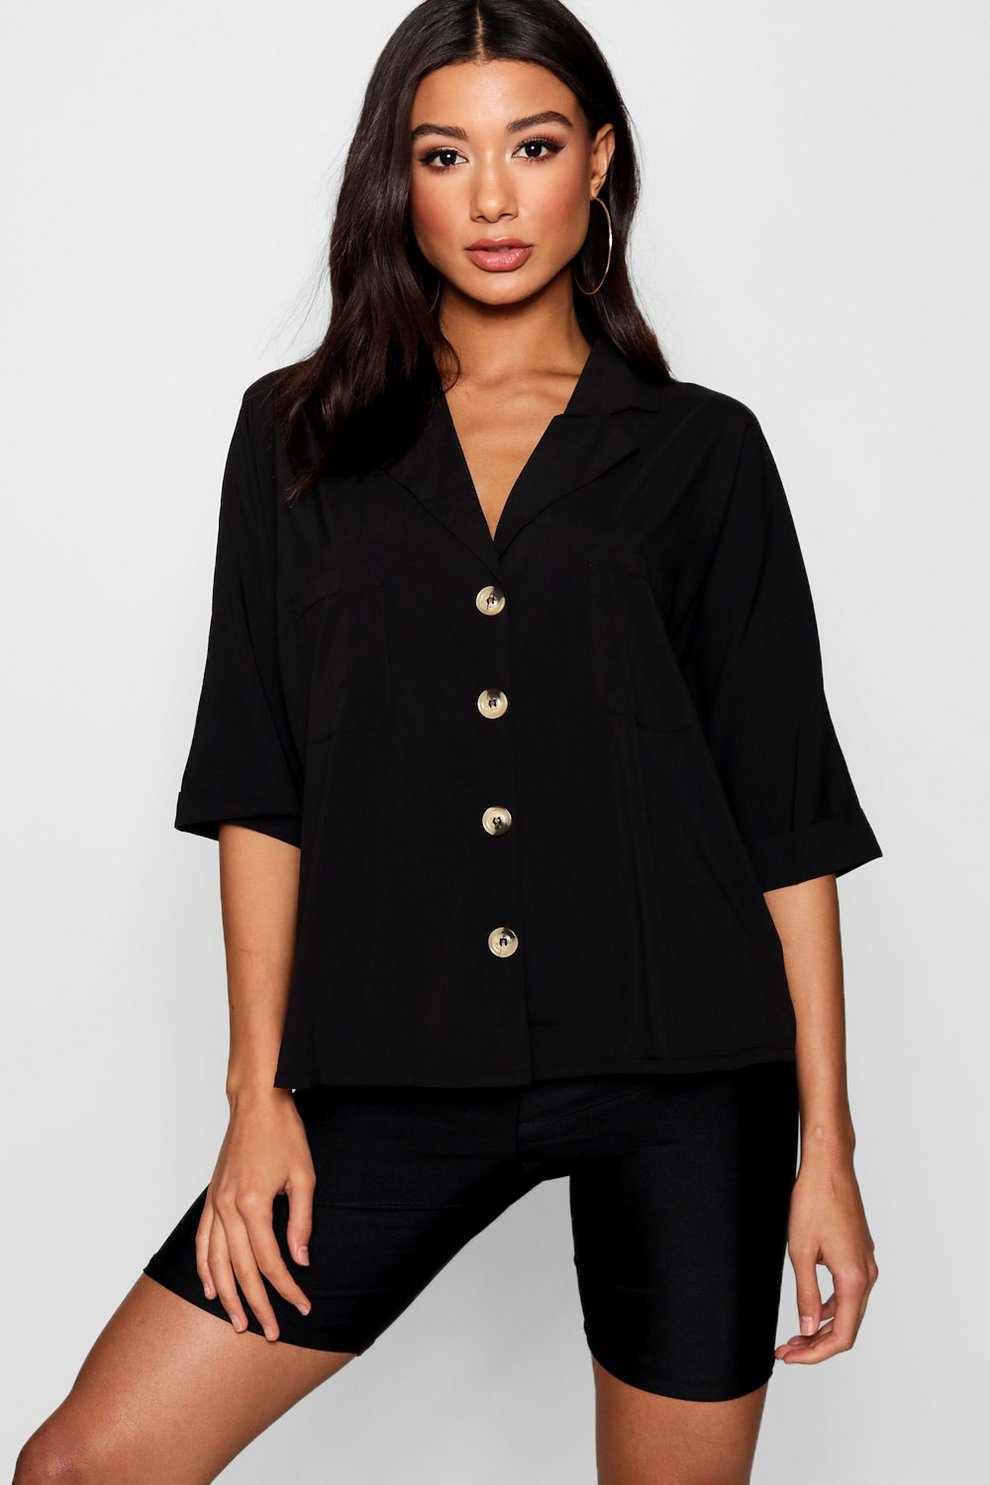 Boohoo Horn Button Detail Revere Collar Shirt Discount Get To Buy Buy Cheap 100% Original jcTyBwth4